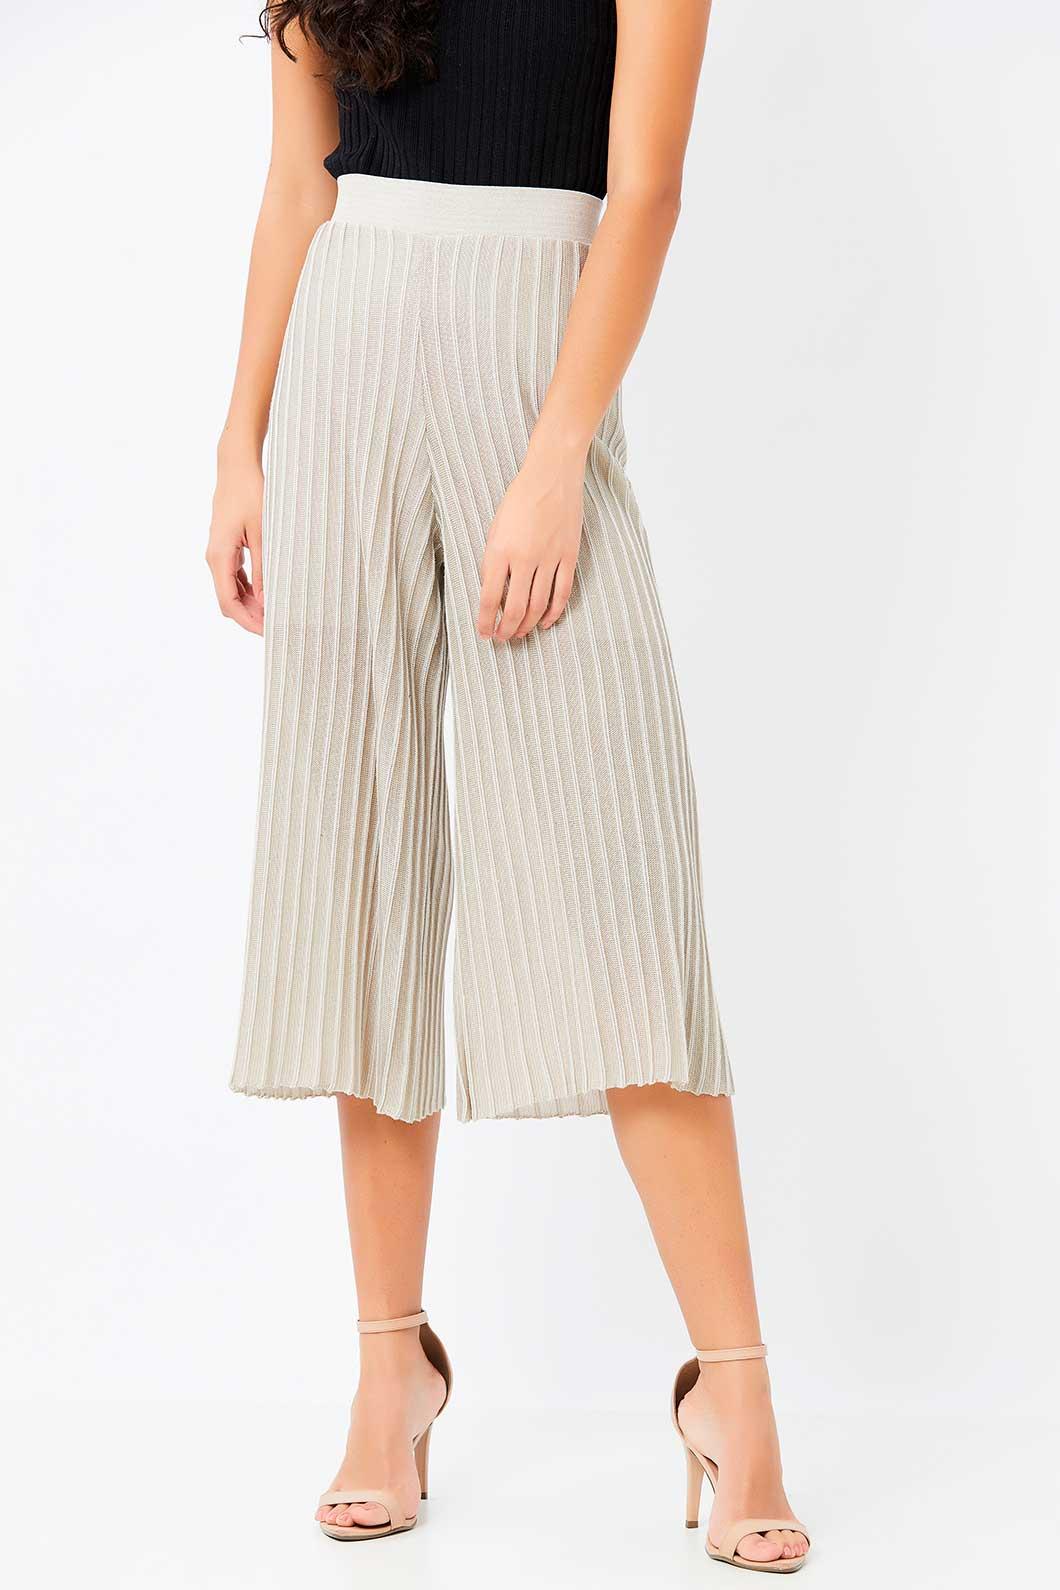 Calça Ralm Pantacourt Pantalona de tricot